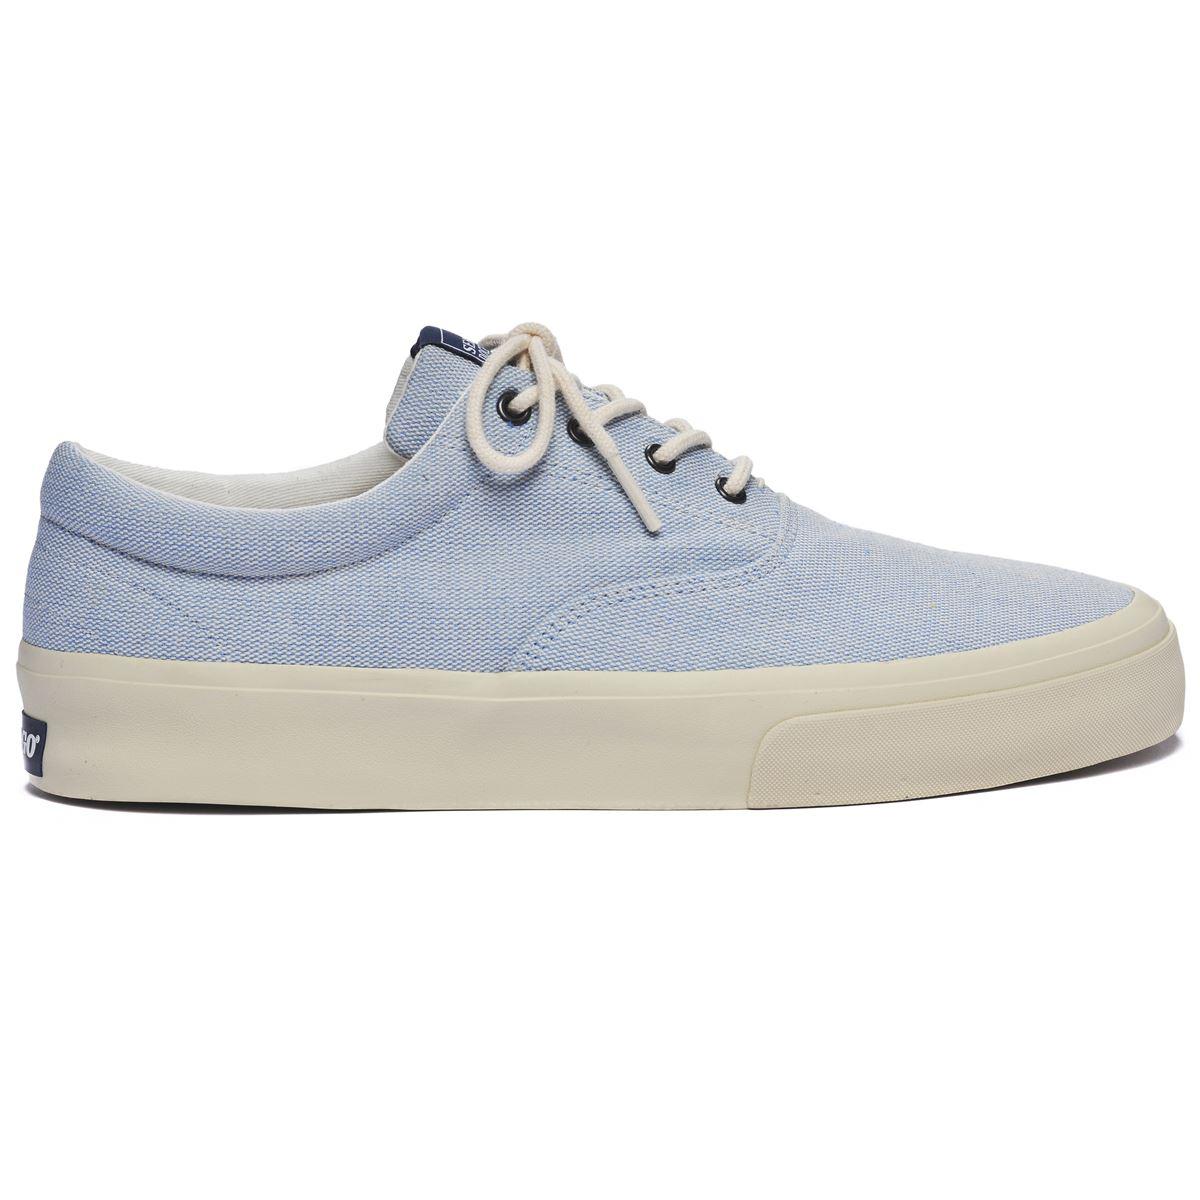 Sebago Sneakers uomo-7002TN0